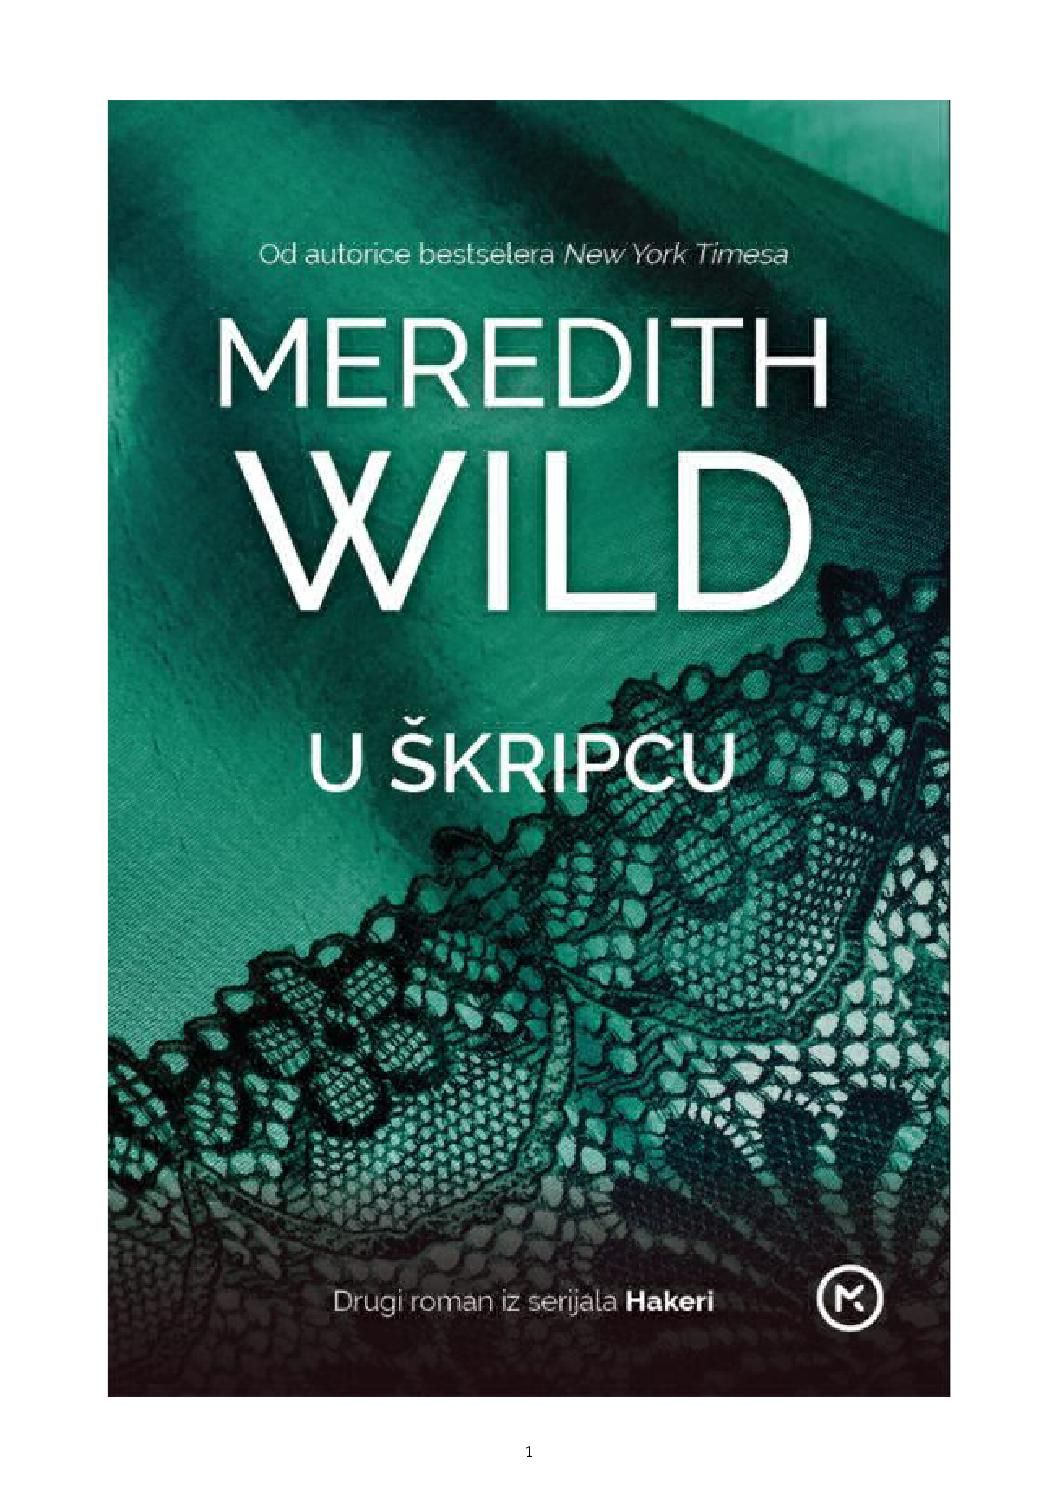 Meredith wild u kripcu pdf e books pinterest meredith wild meredith wild u kripcu pdf fandeluxe Gallery